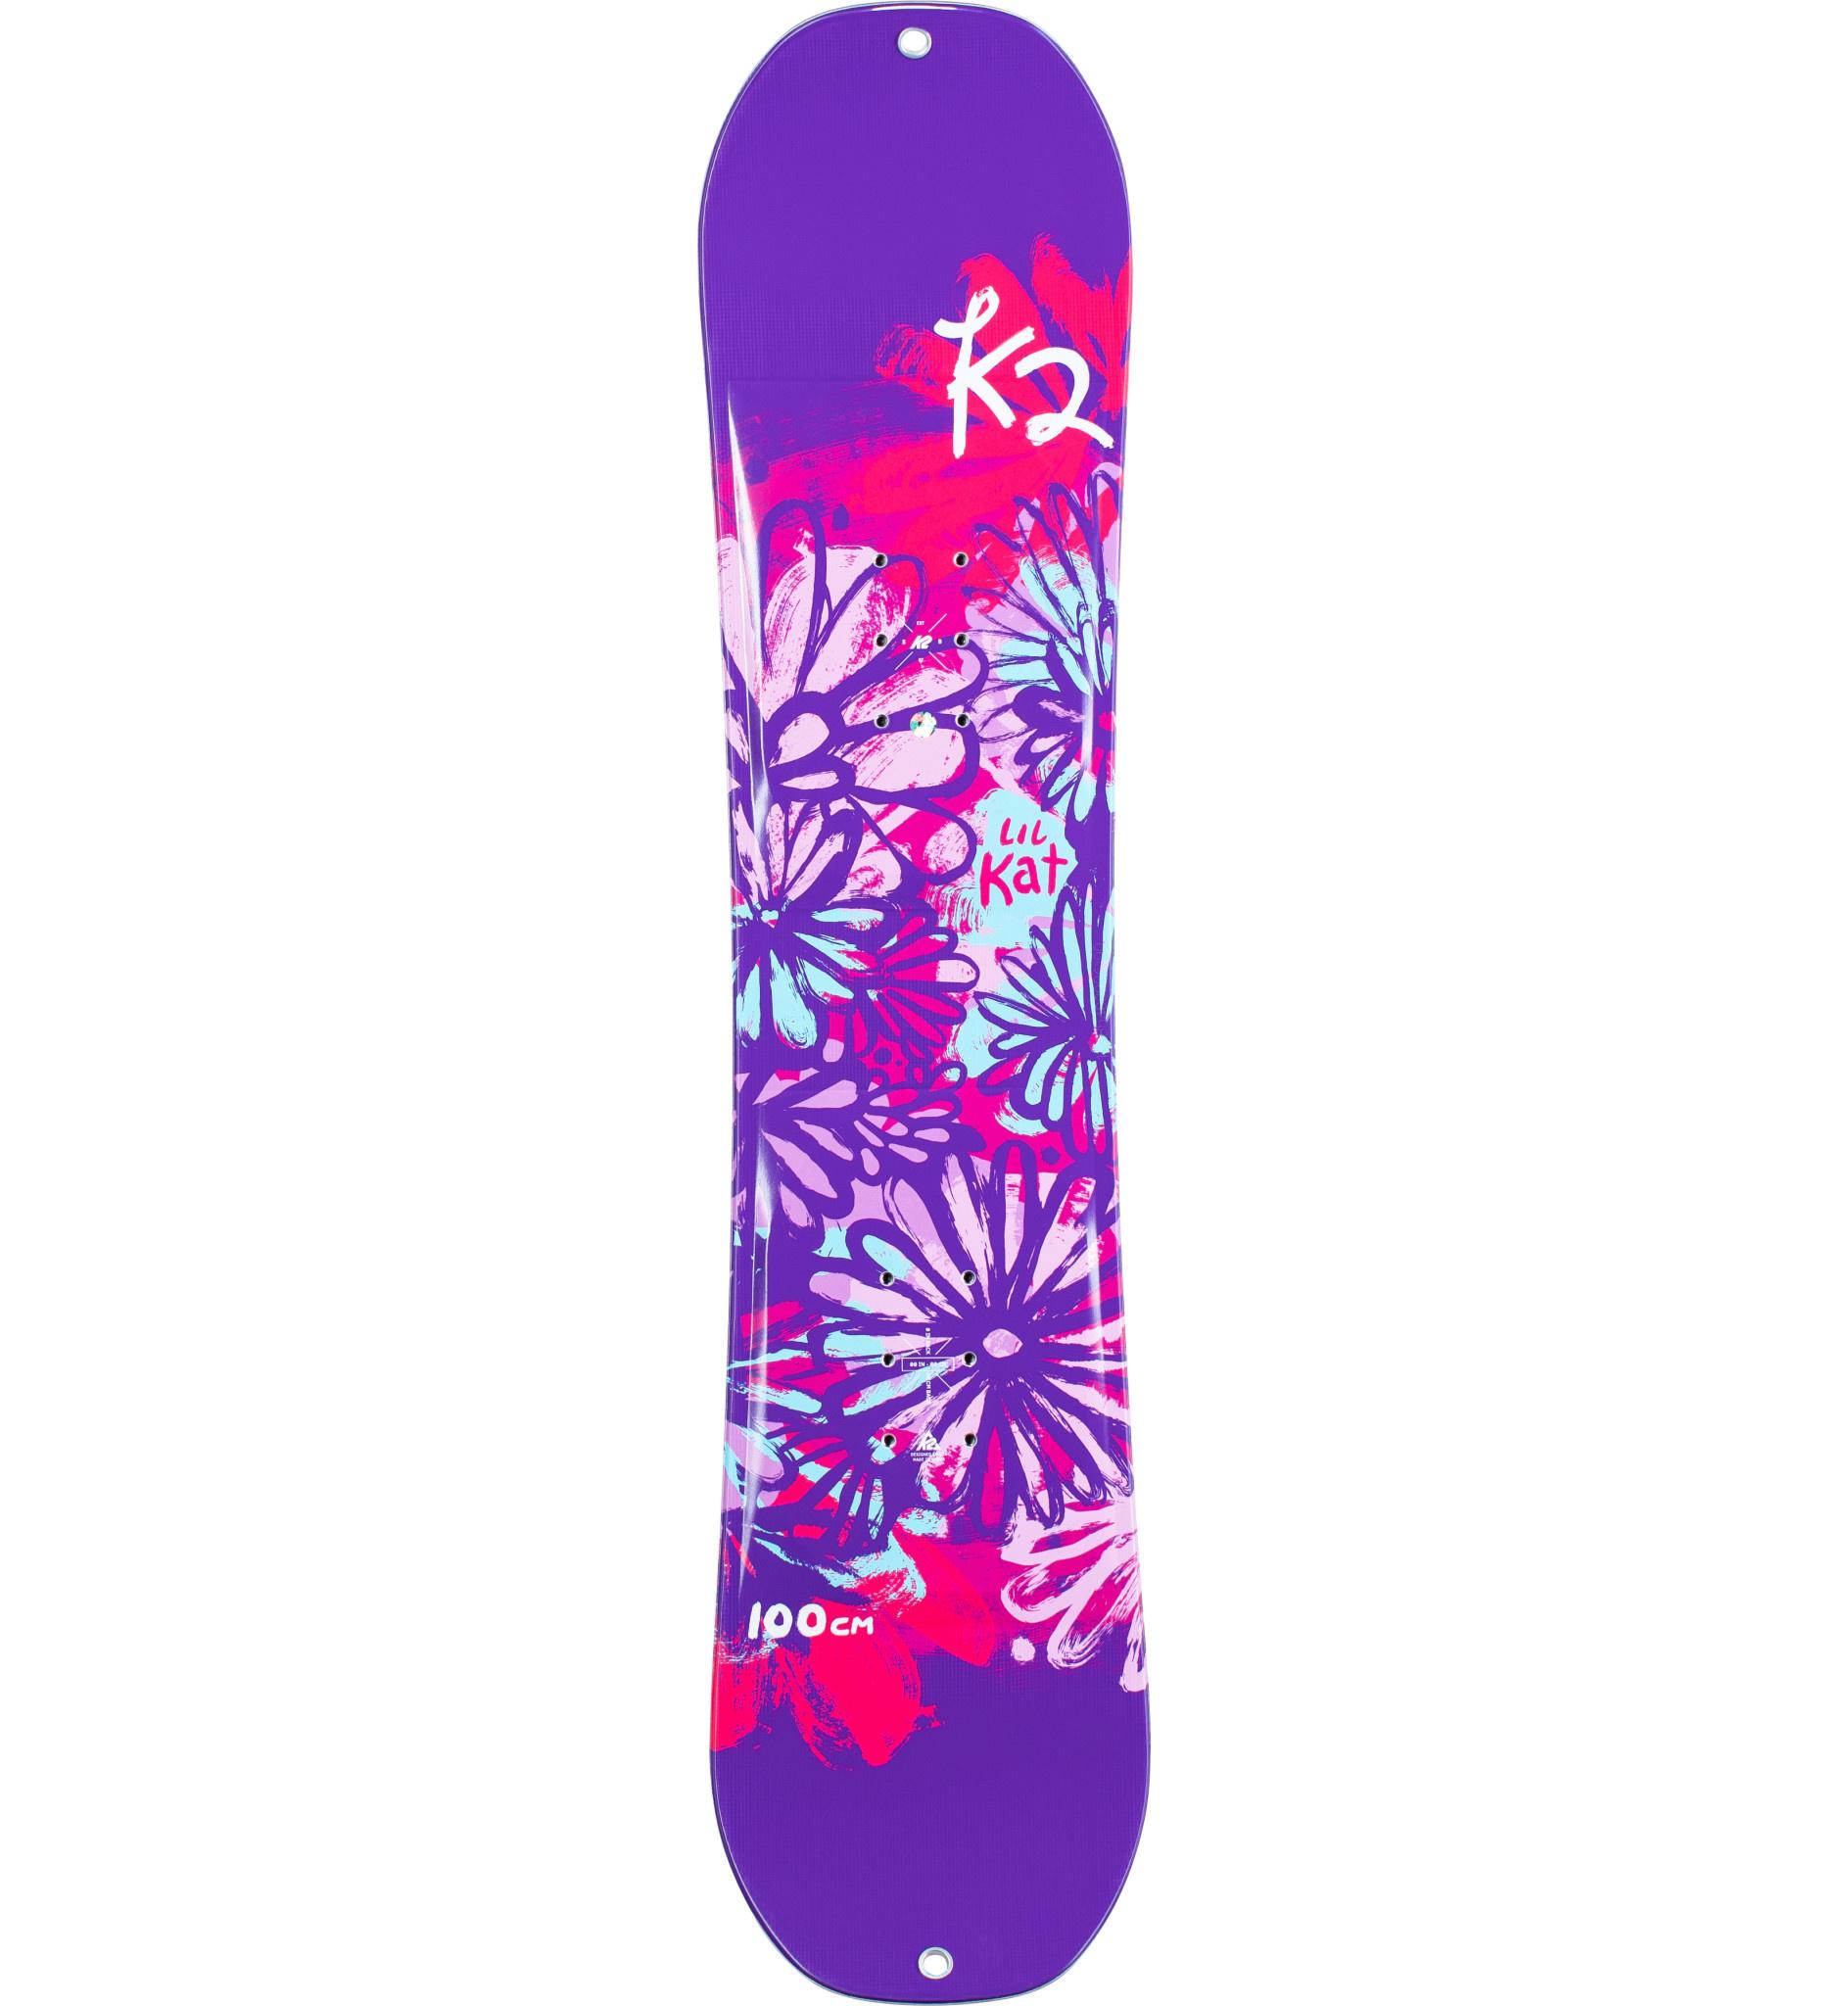 K2 K2 Girls Lil Kat Snowboard (2021)